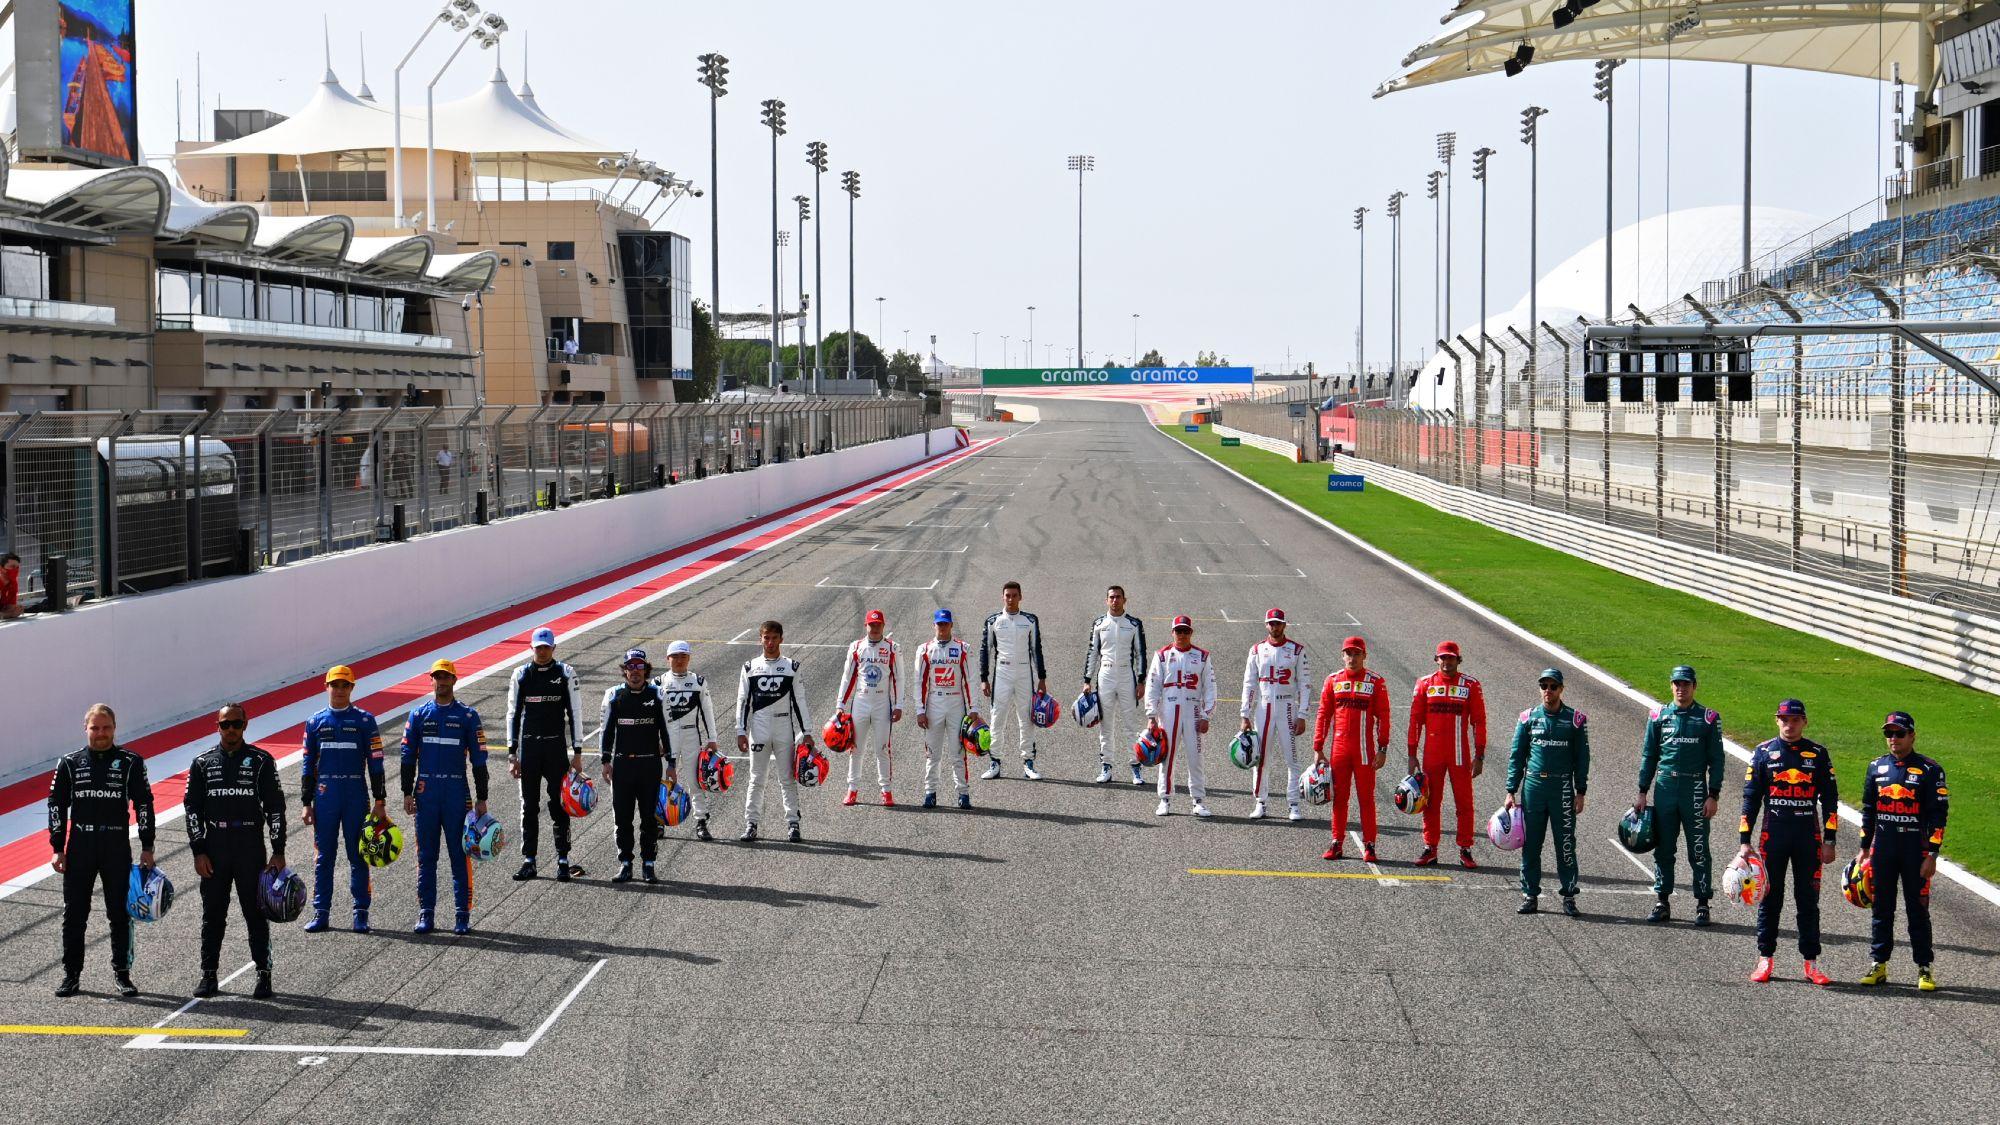 2021 Formula 1 grid